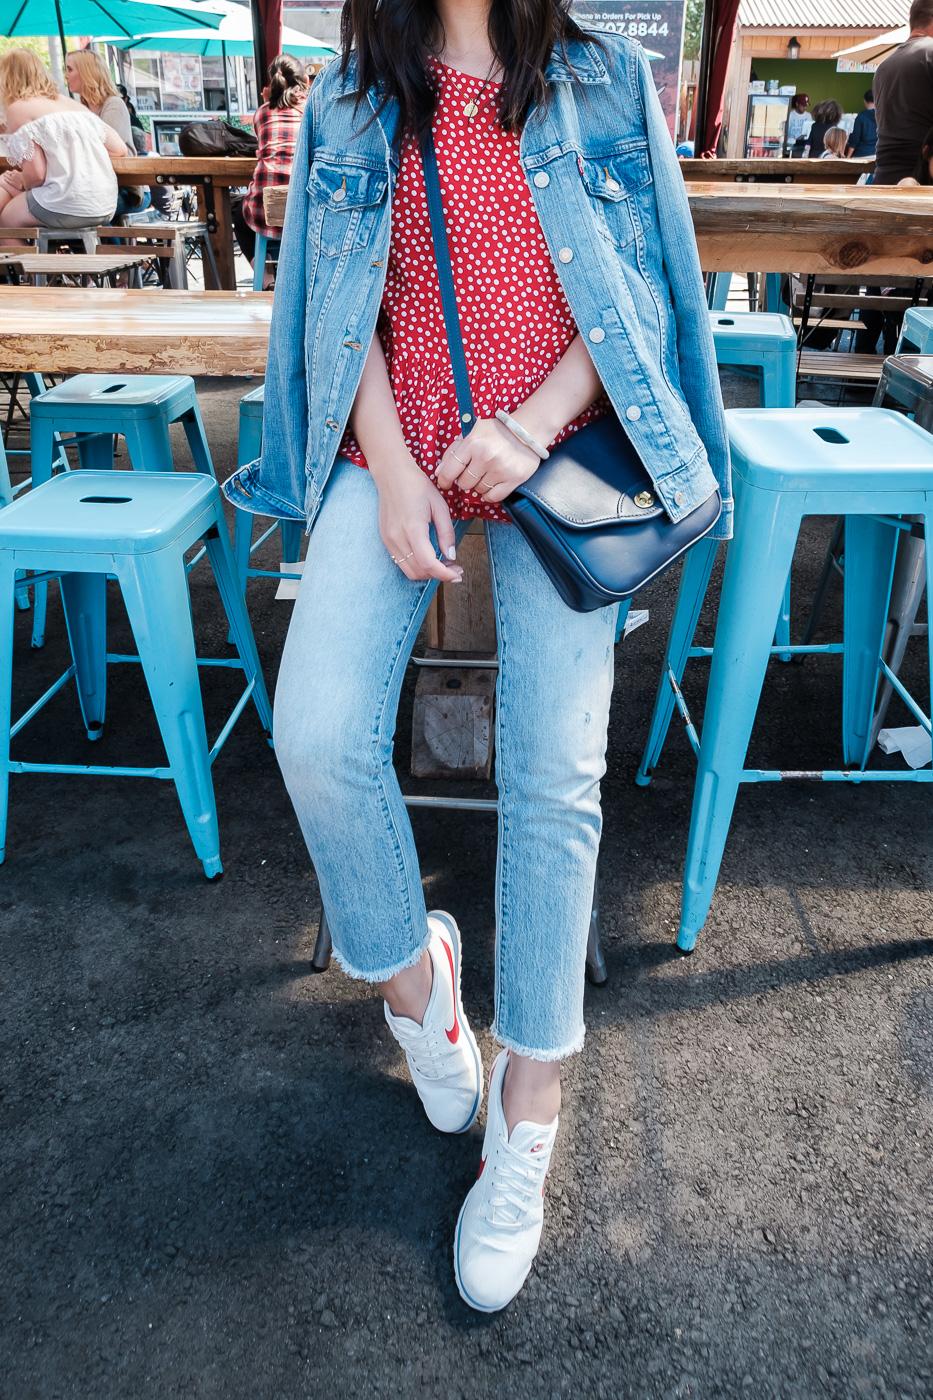 polka-dot-trend-how-to-wear-polka-dots